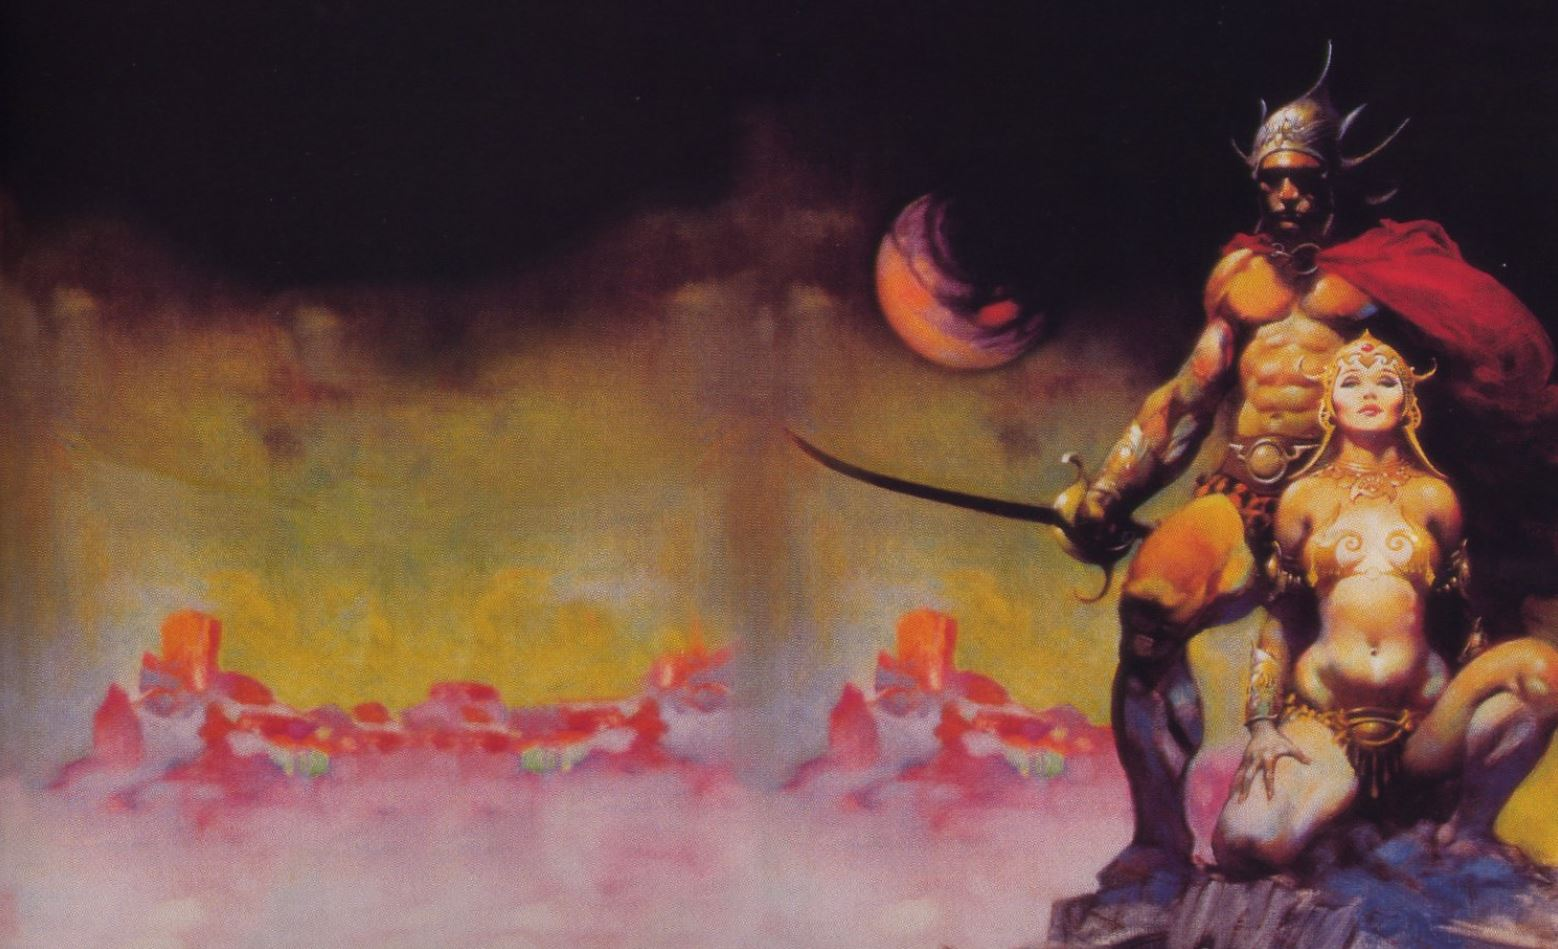 A FIGHTING MAN OF MARS by Frank Frazetta